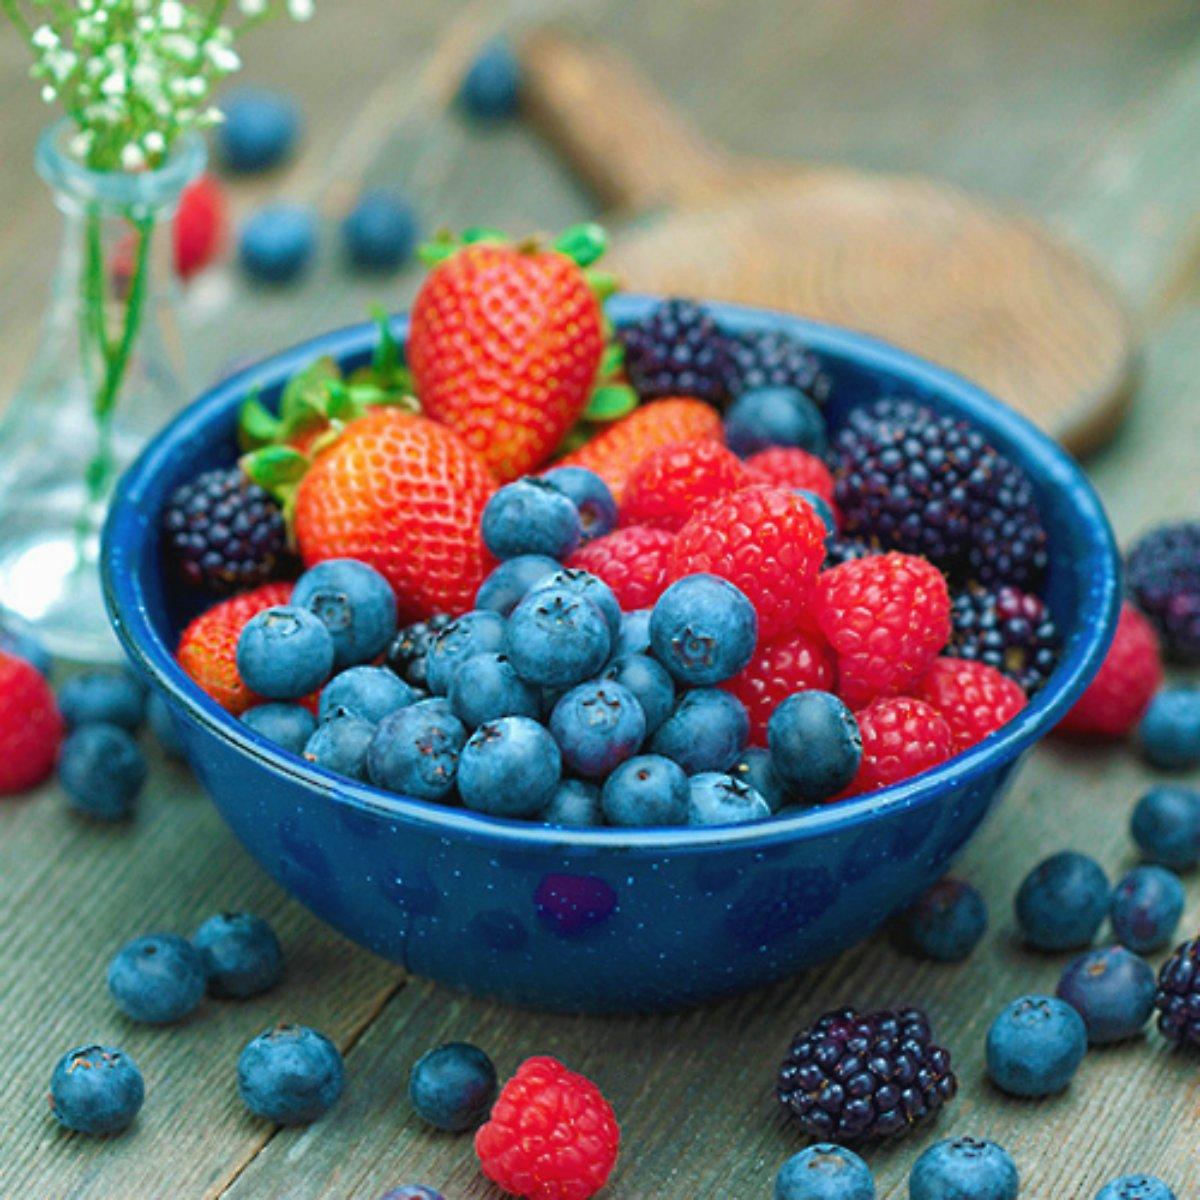 Carb fruits and veggies pdf